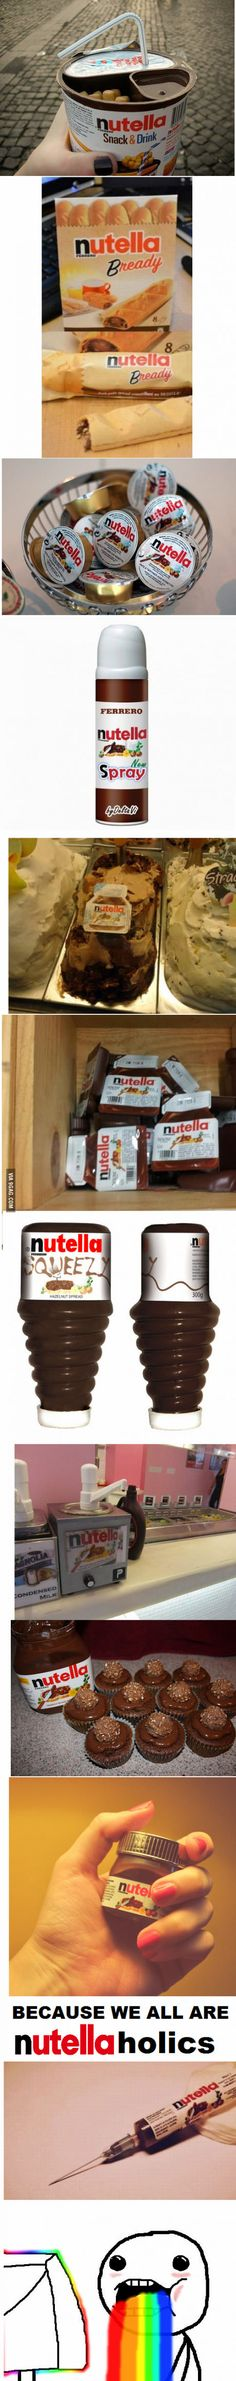 I heard you like NUTELLA...